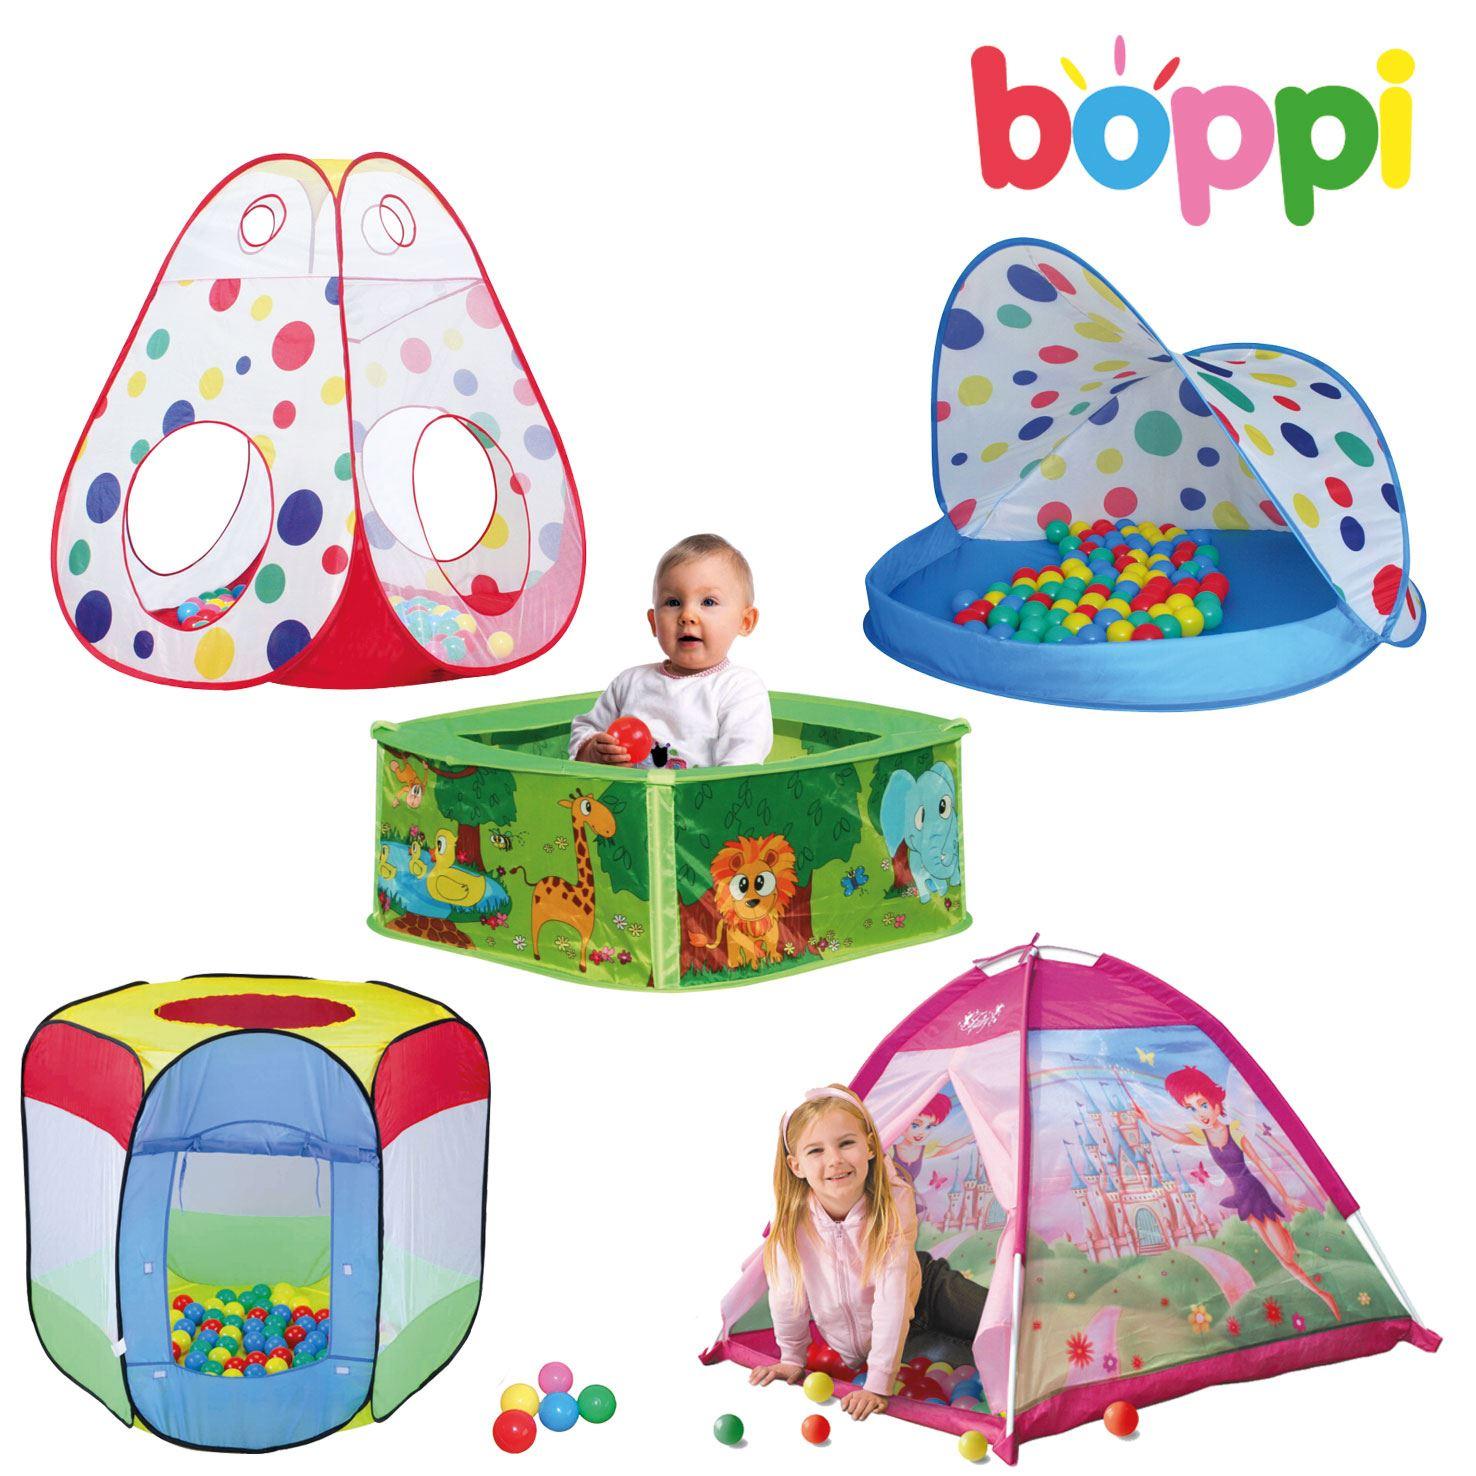 kinder kleinkind spielen zelt mit 50 b lle ballpit stift pop up indoor outdoor. Black Bedroom Furniture Sets. Home Design Ideas